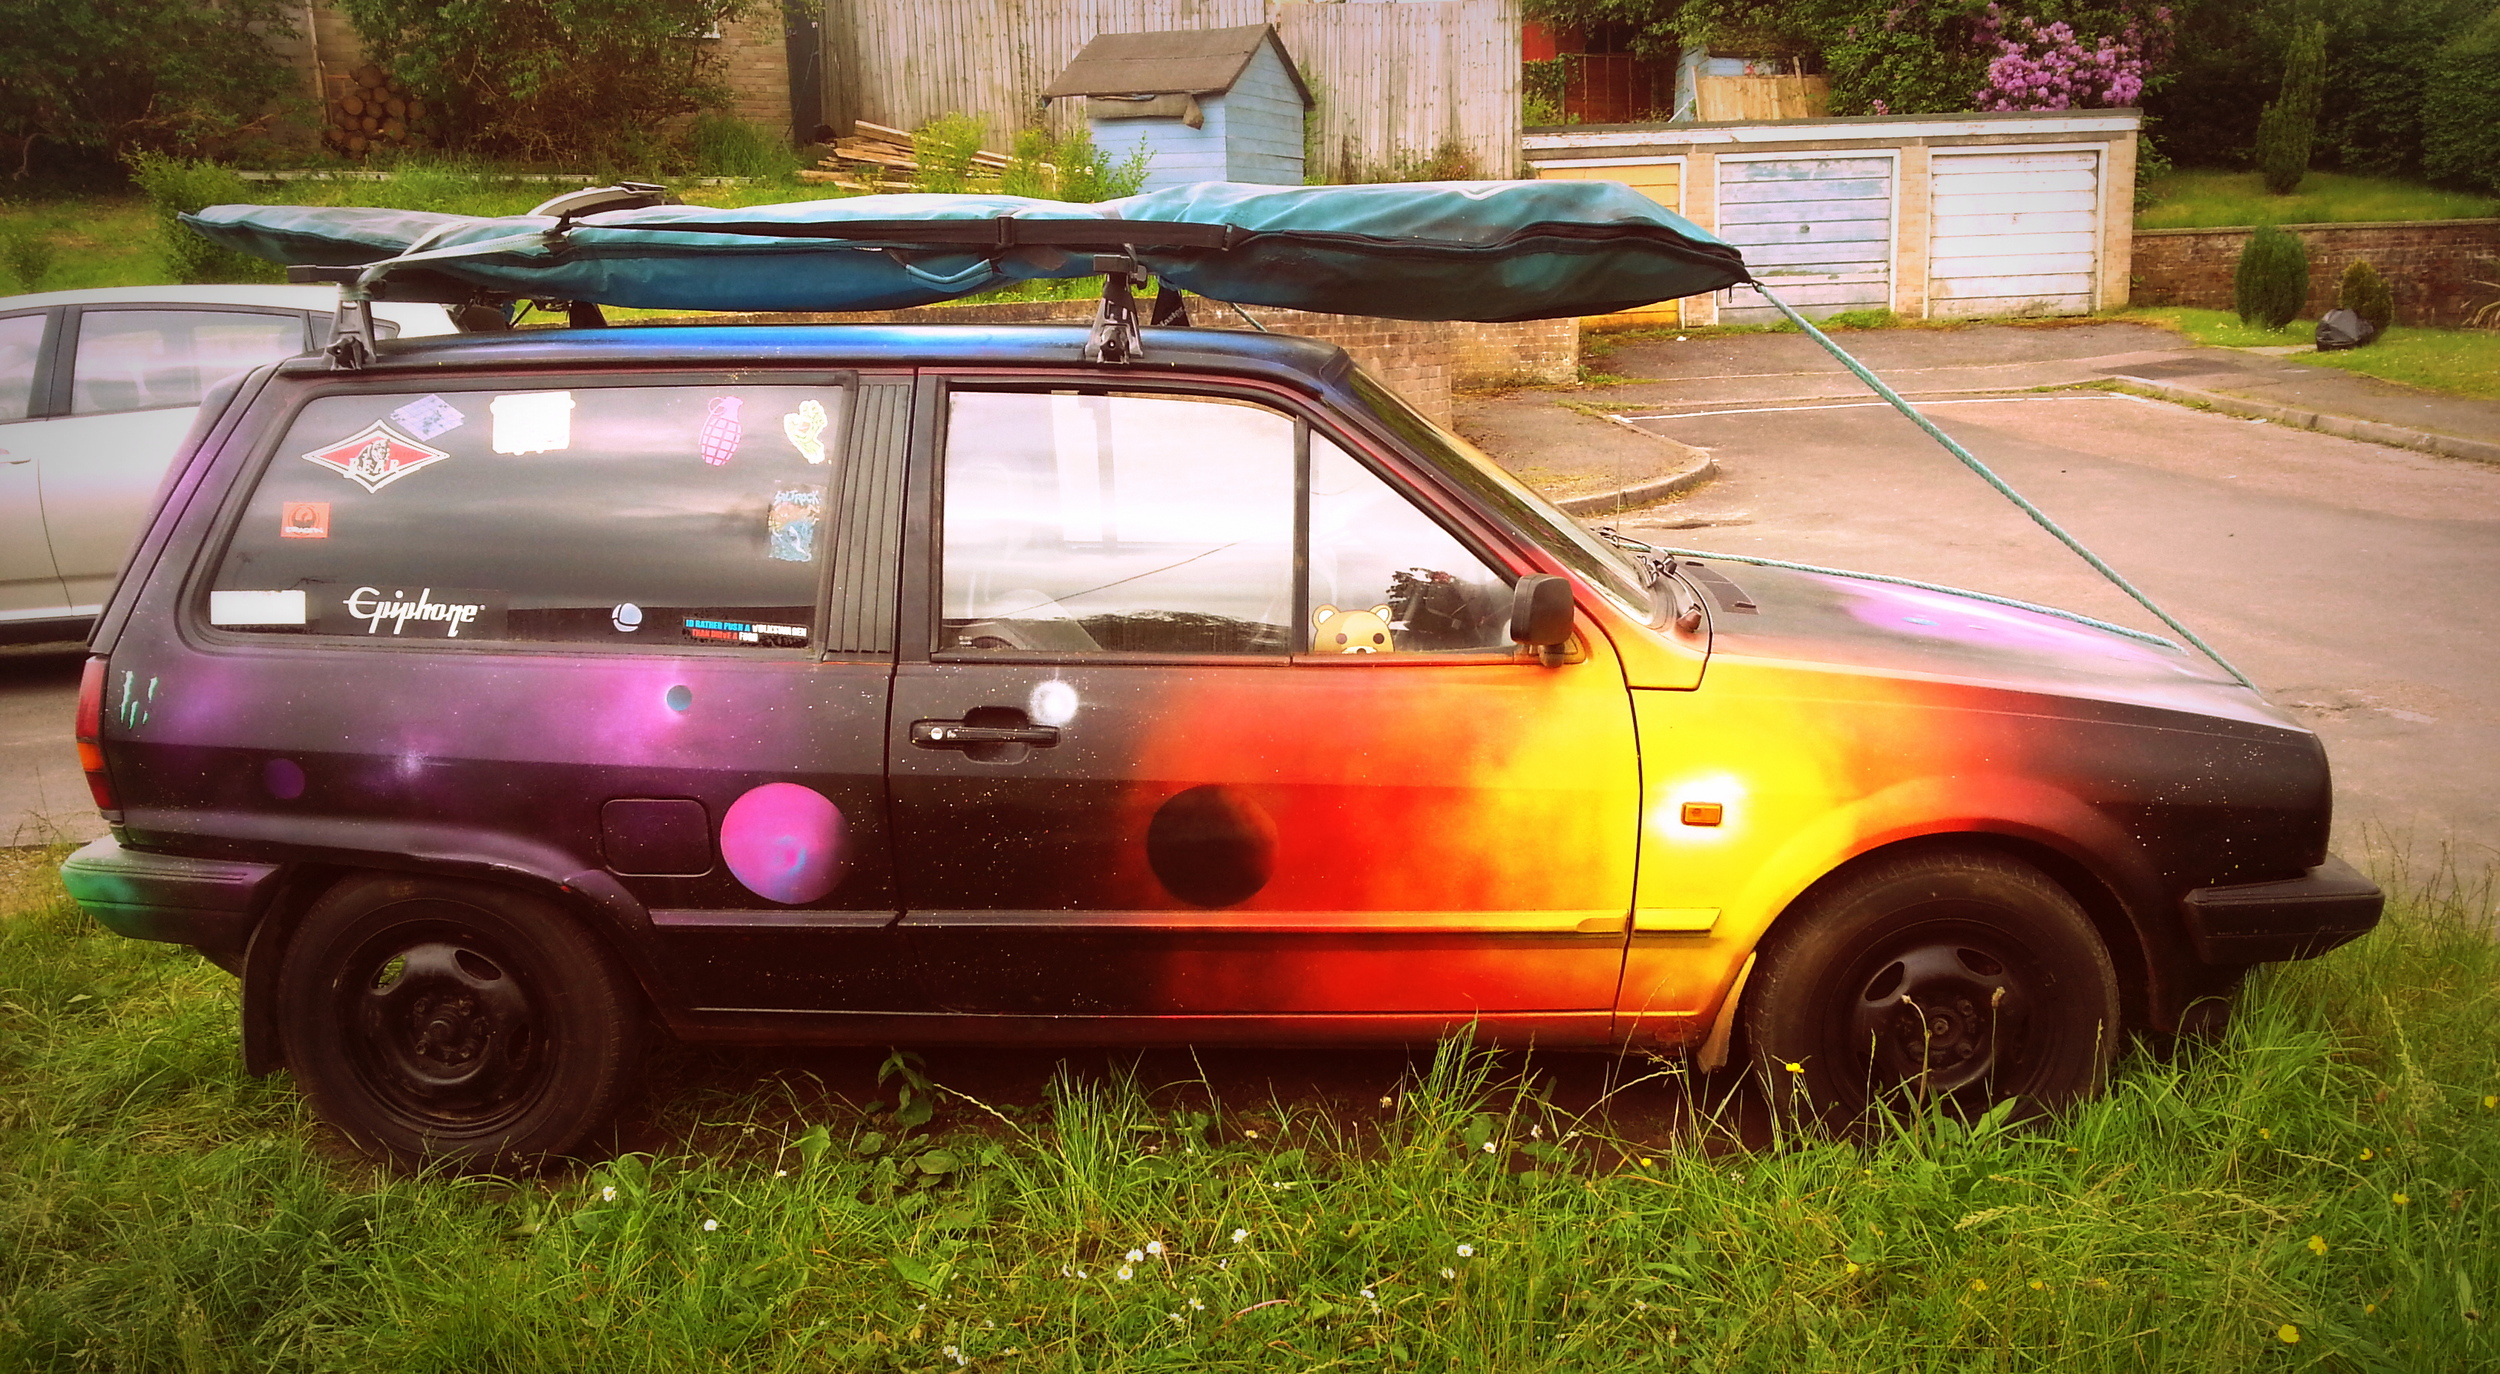 My cosmic car